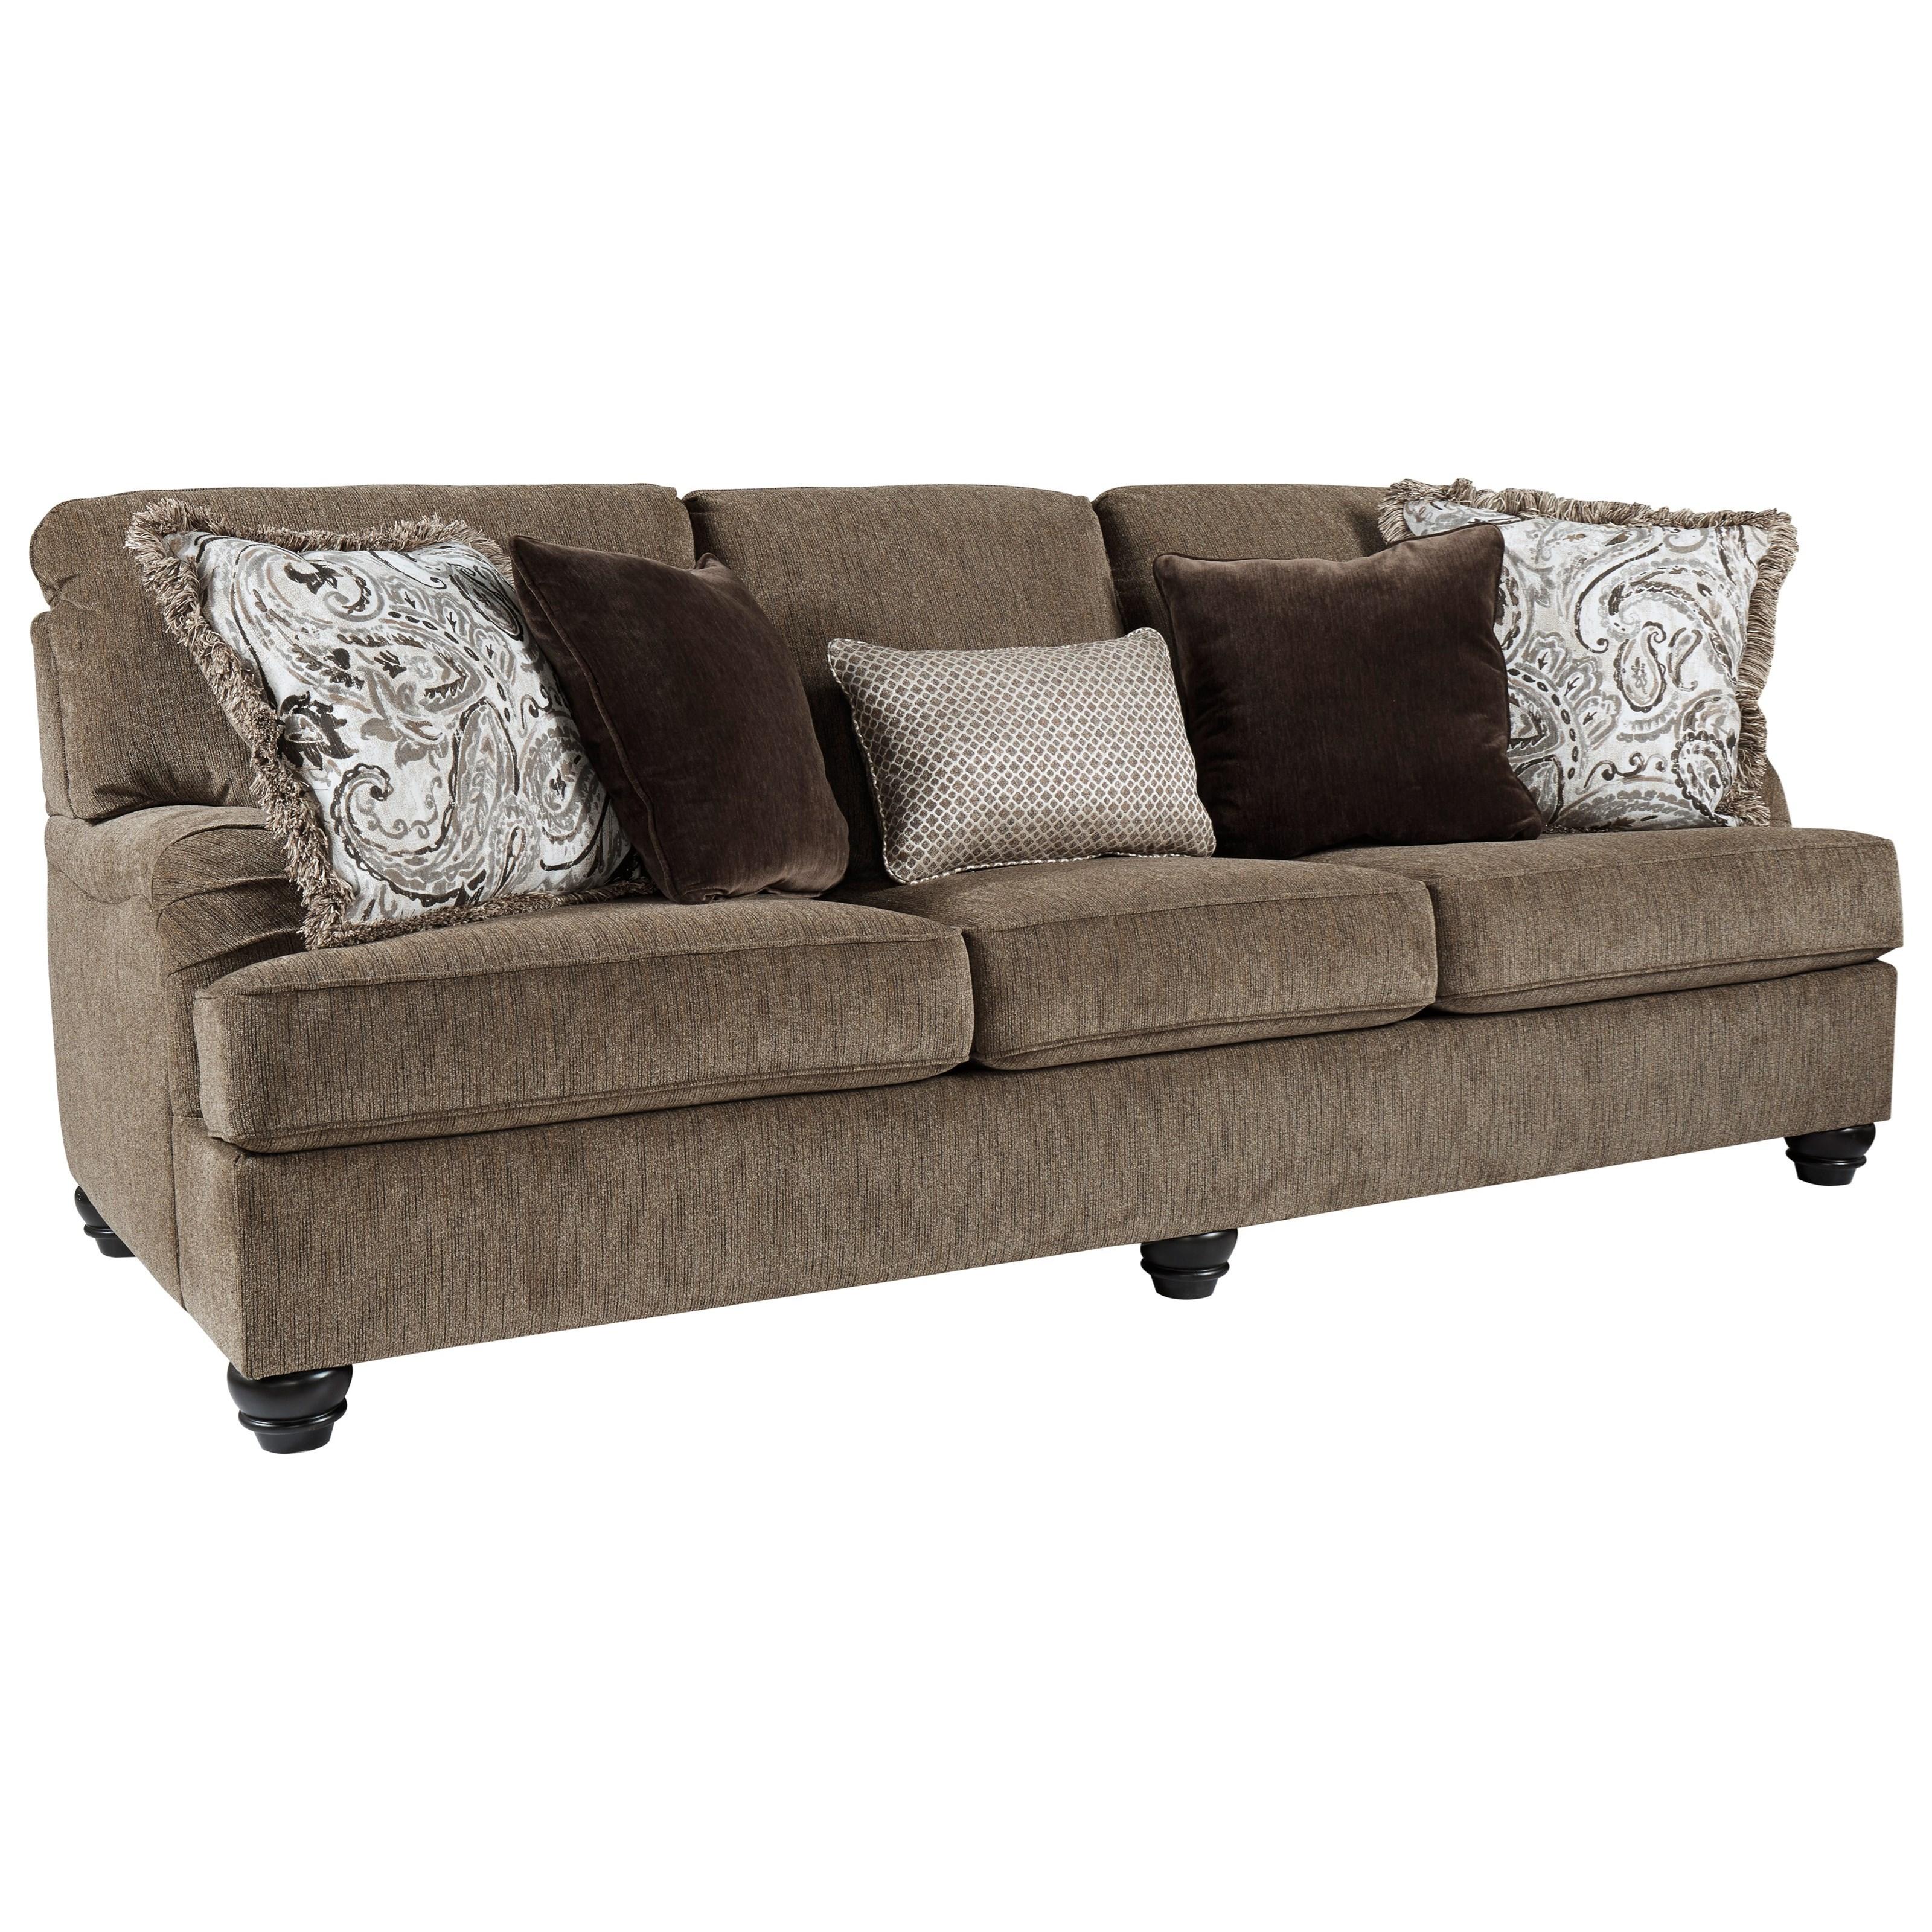 Benchcraft Braemar Transitional Queen Sofa Sleeper With